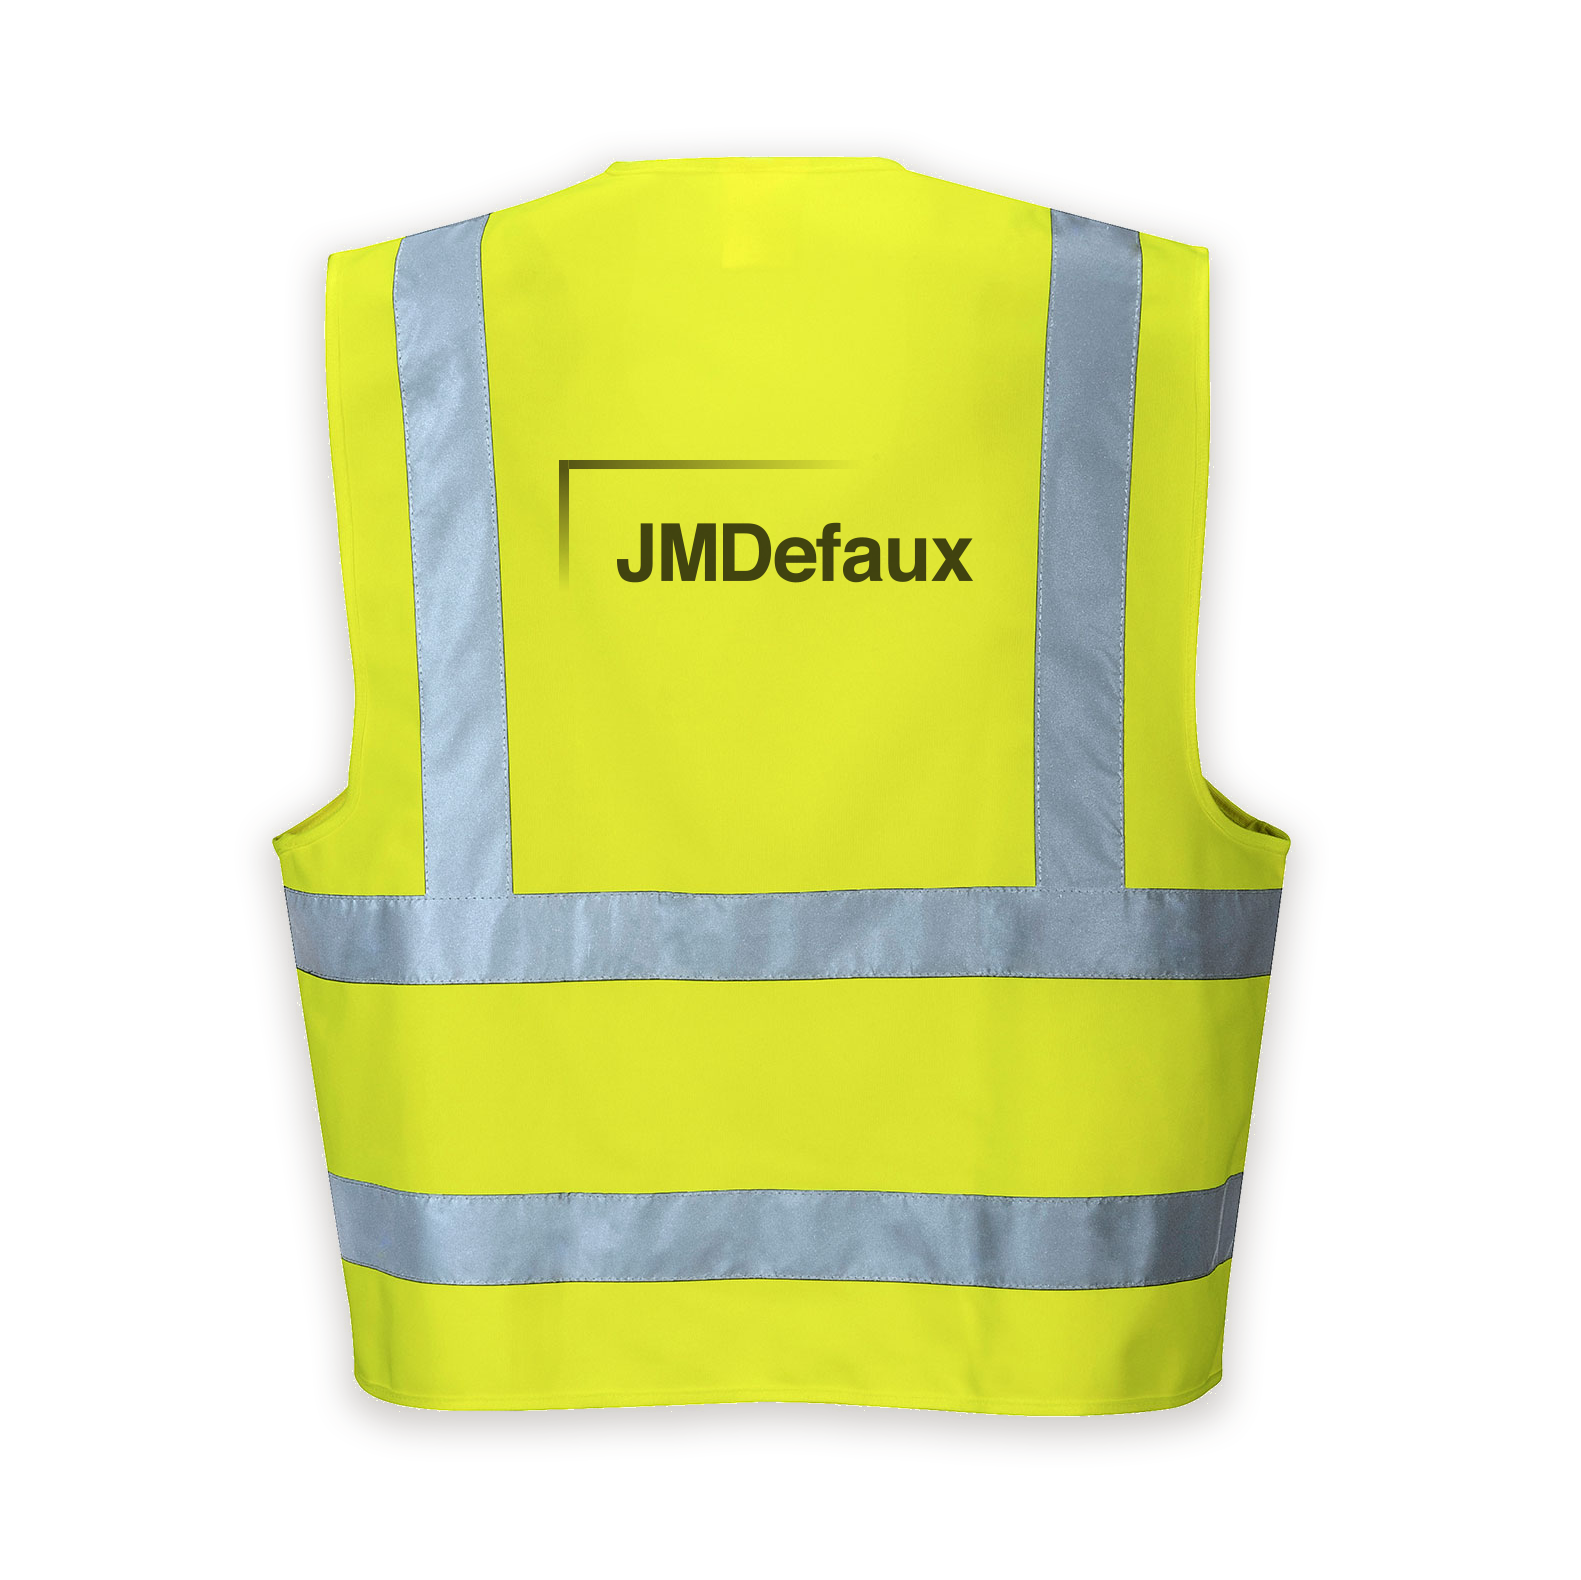 jmdefaux